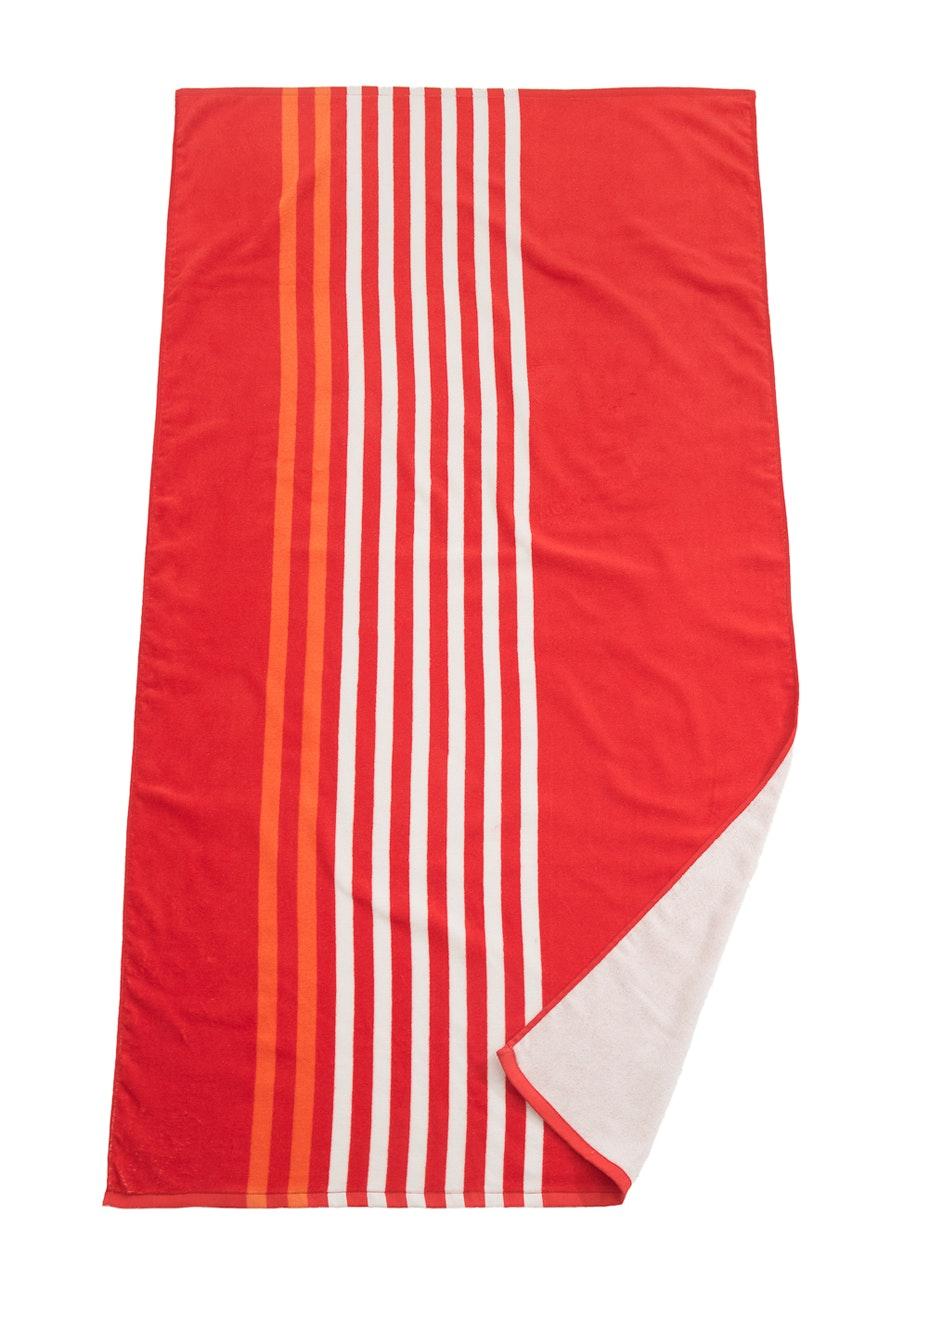 Portsea Printed Beach Towel Red